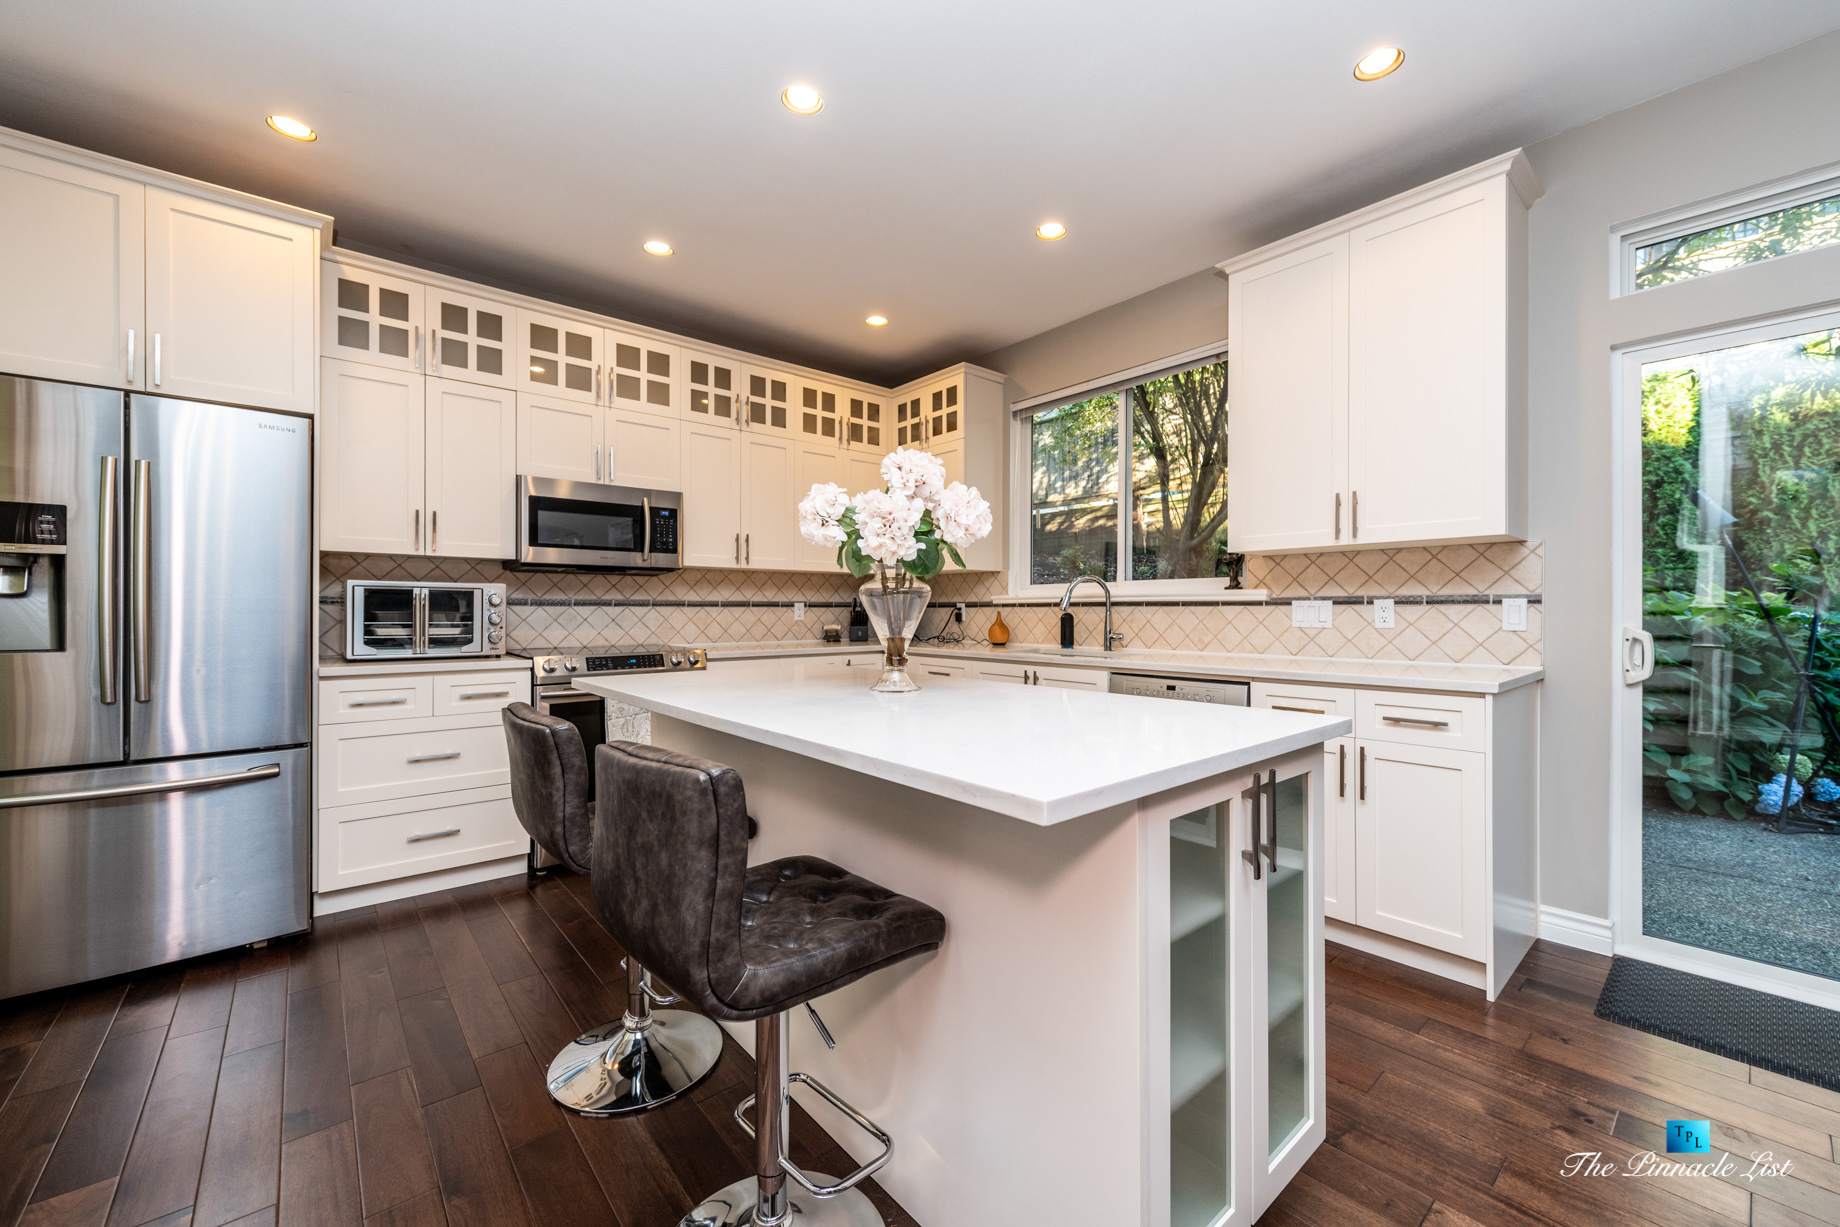 2366 Sunnyside Rd, Anmore, BC, Canada – Kitchen Island